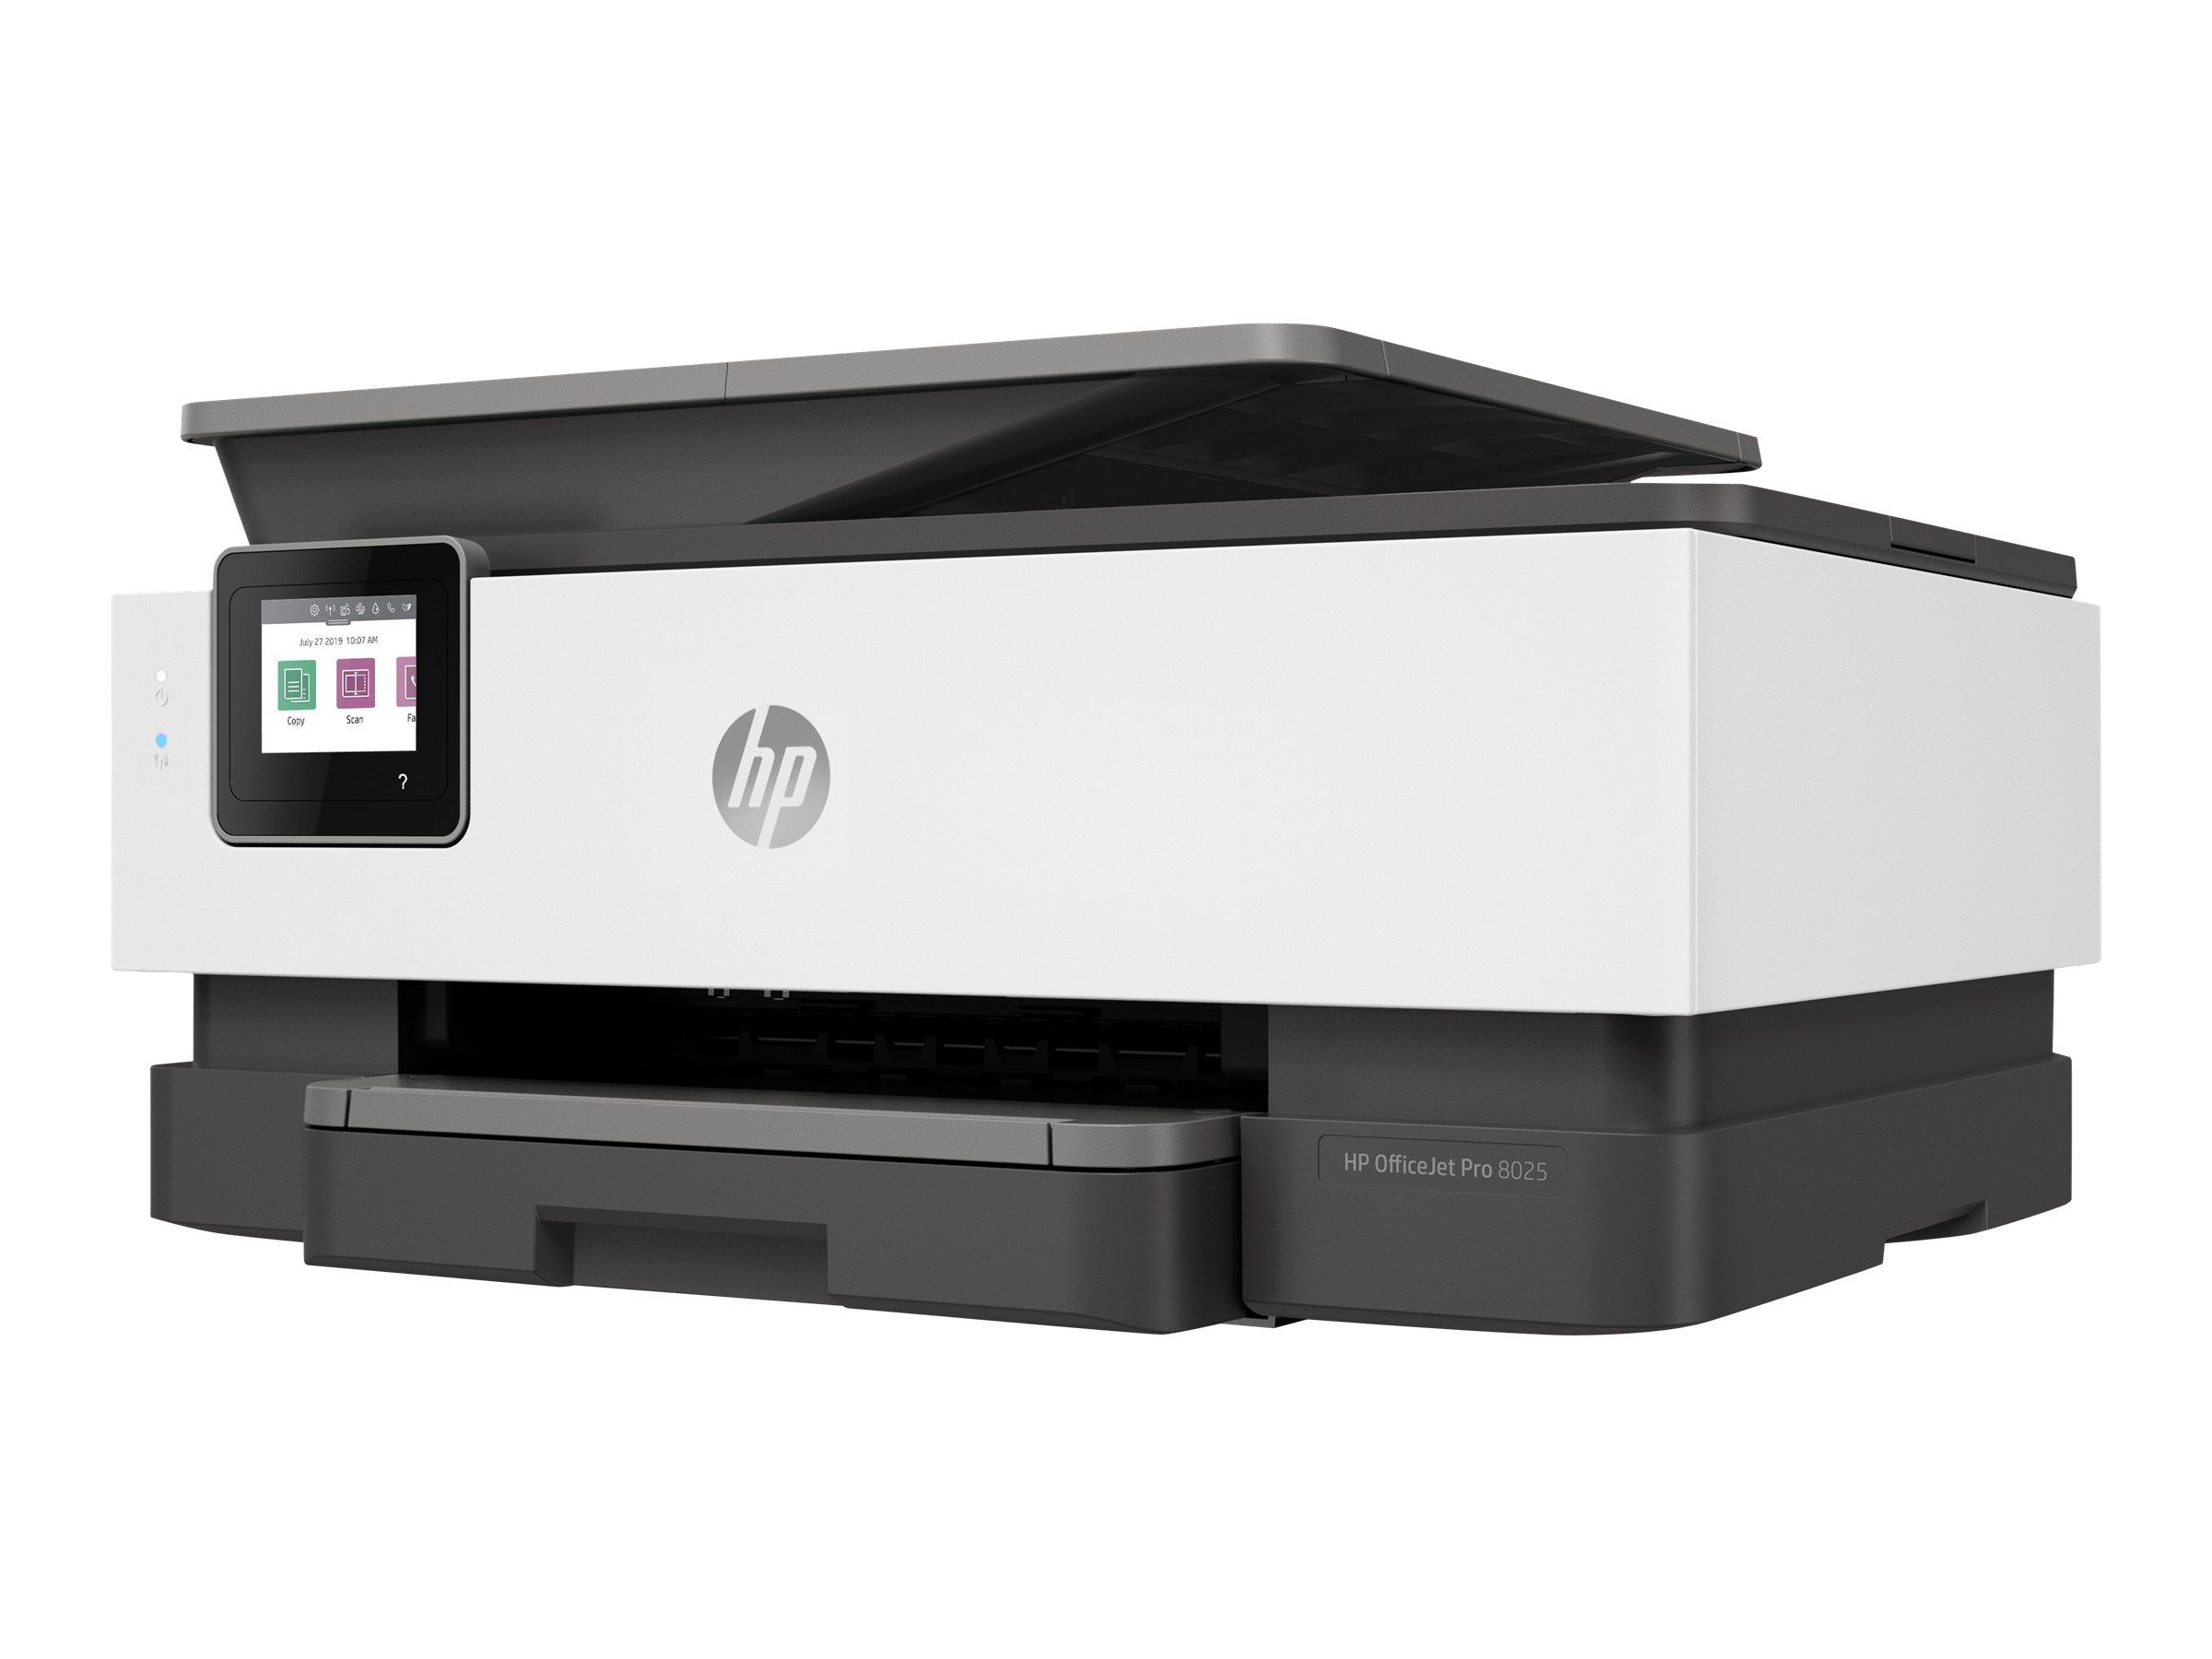 HP Officejet Pro 8025 All-in-One - Multifunktionsdrucker - Farbe - Tintenstrahl - 216 x 297 mm (Original) - A4/Legal (Medien)